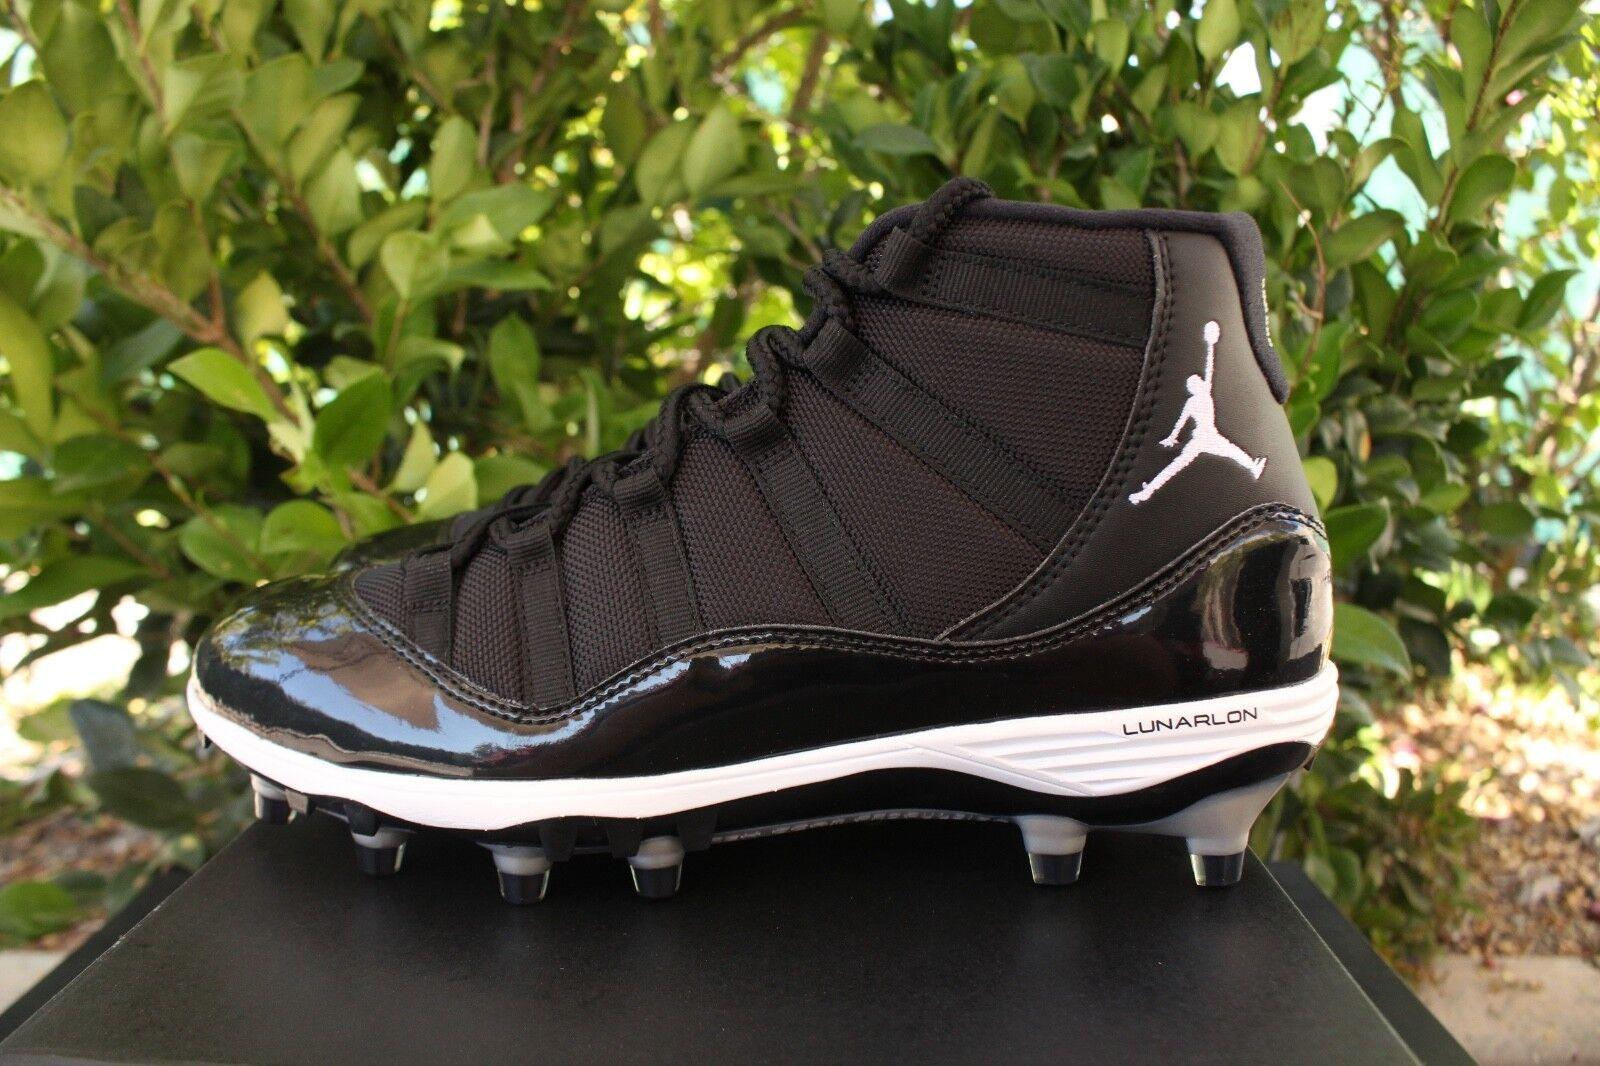 Nike Air Jordan 11 Retro Xi TD Cornamusa Plata Sz 9 Negro Blanco Plata Cornamusa AO1561011 335dbb